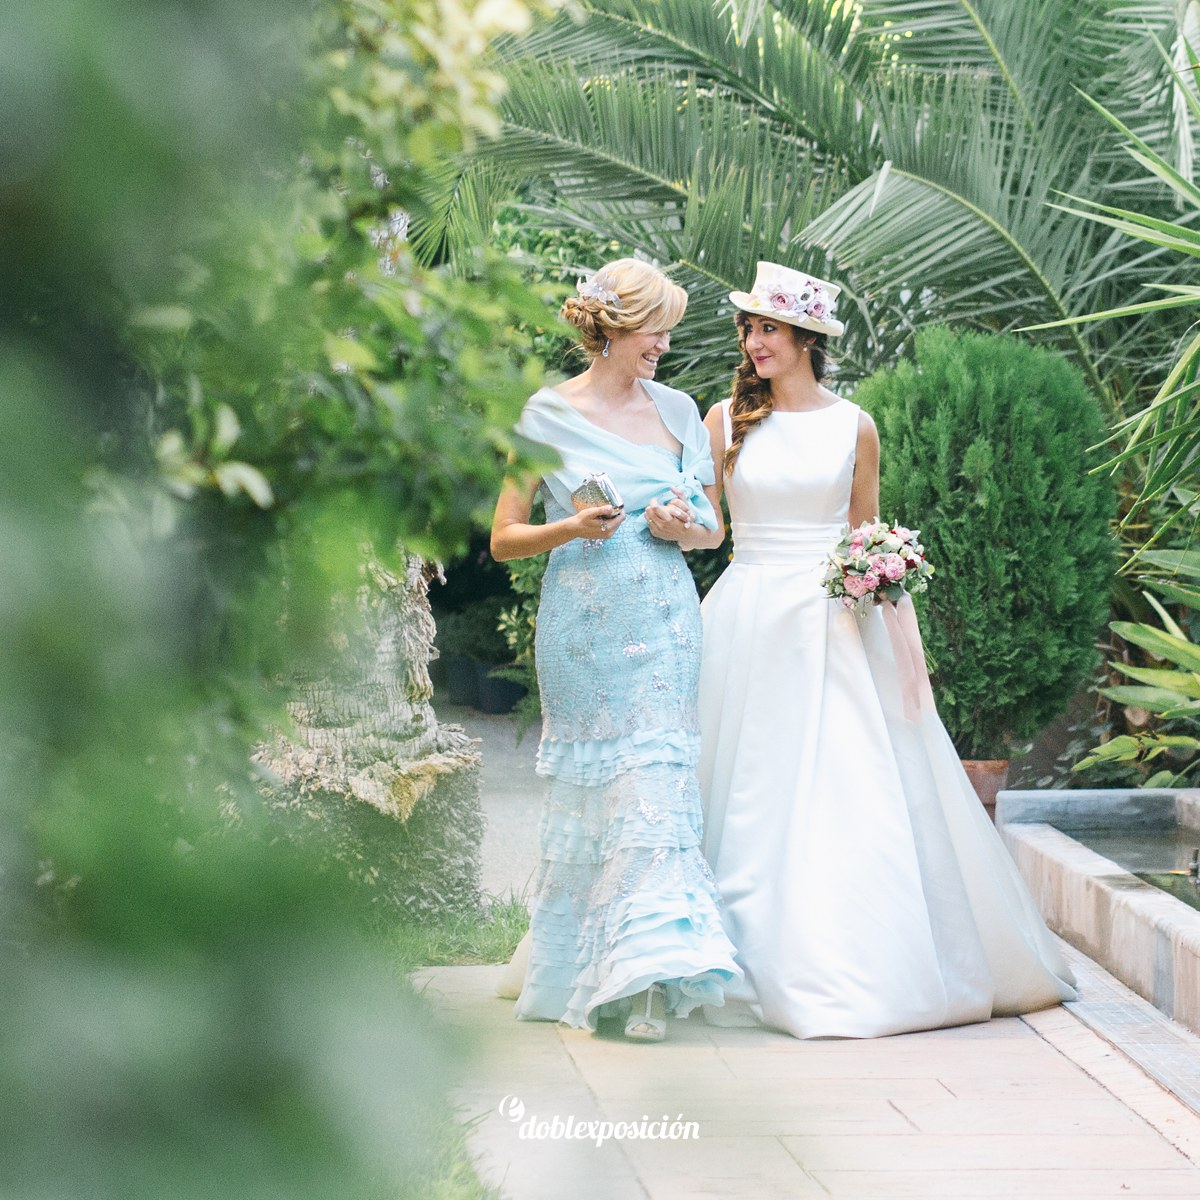 fotografos-boda-finca-restaurante-jardines-nou-cucuch-elche-novelda_0018